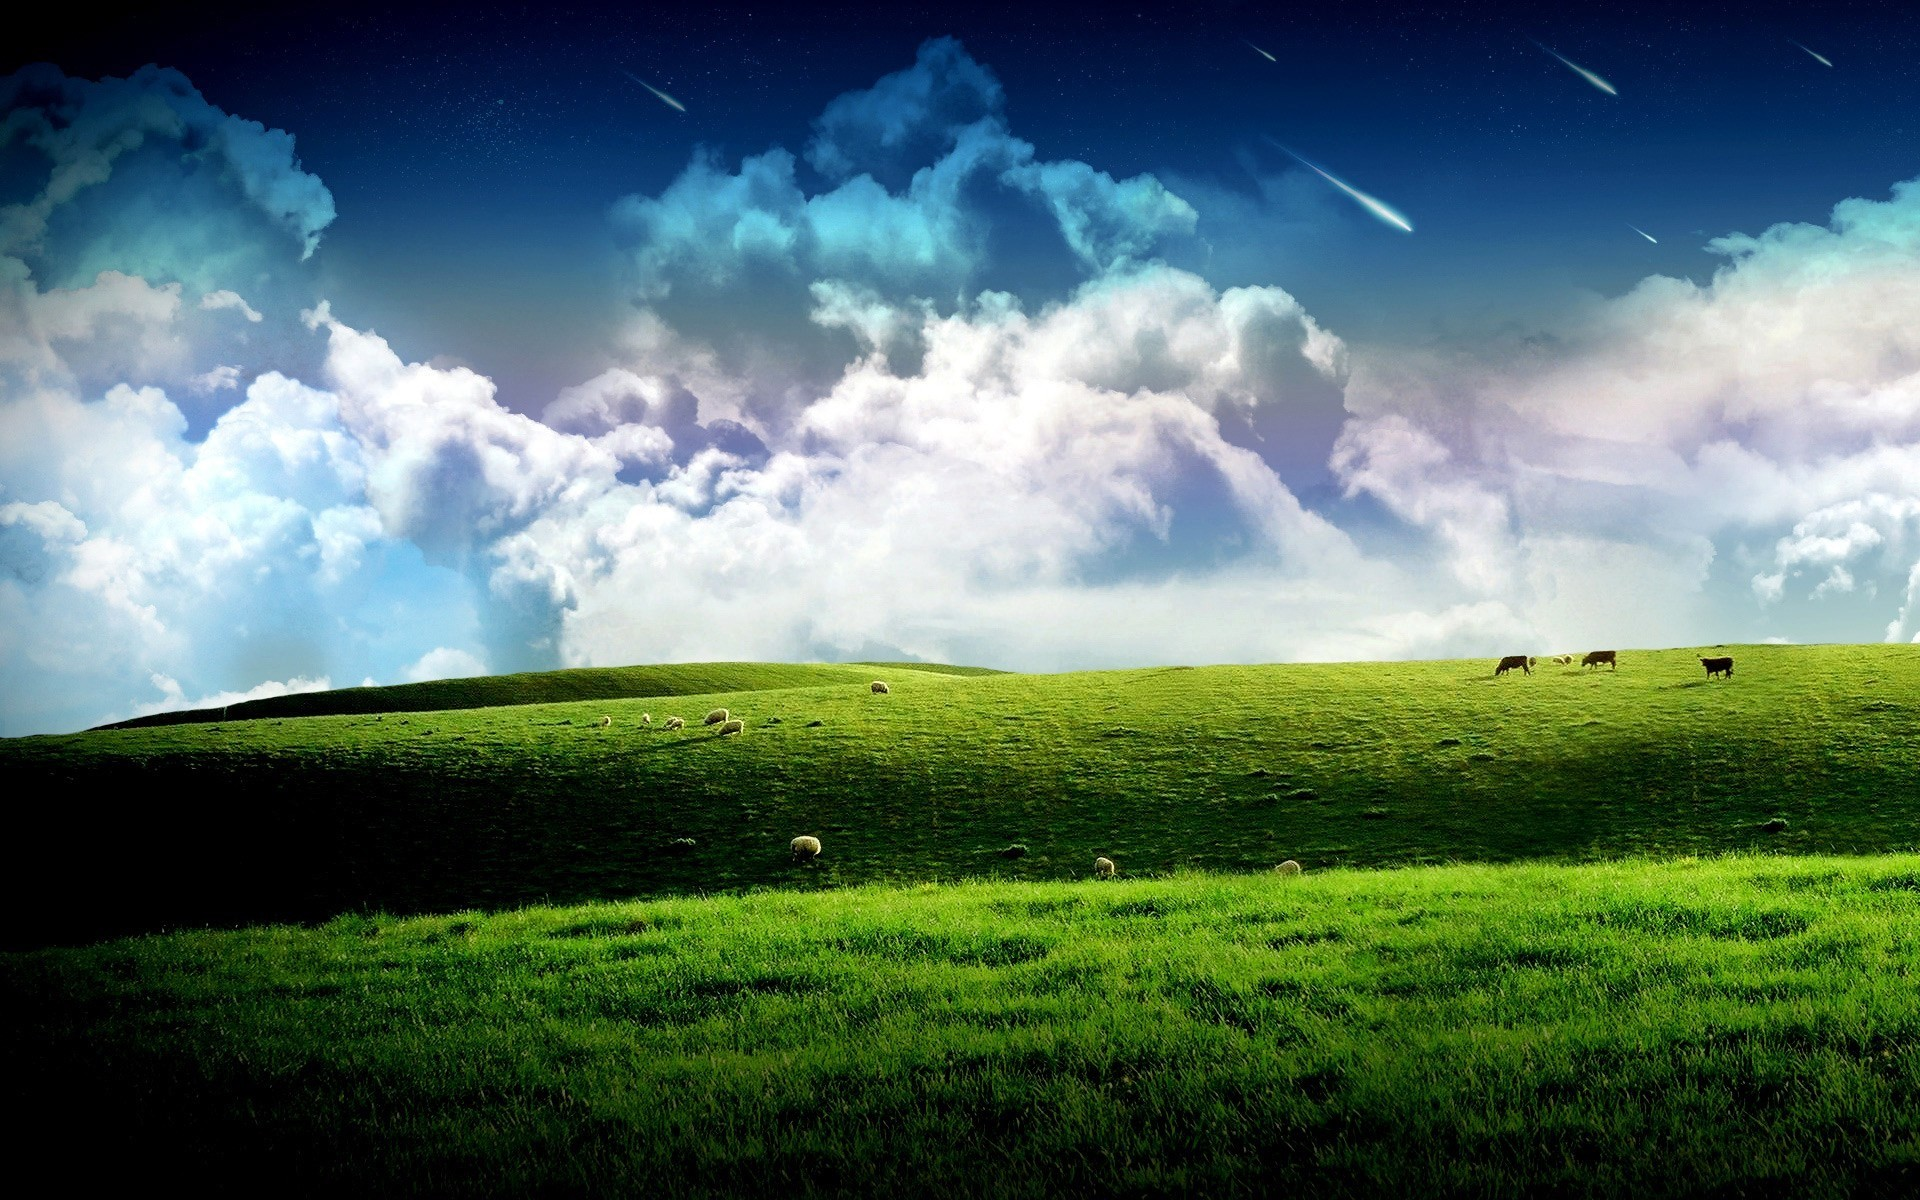 landscape background wallpaper free